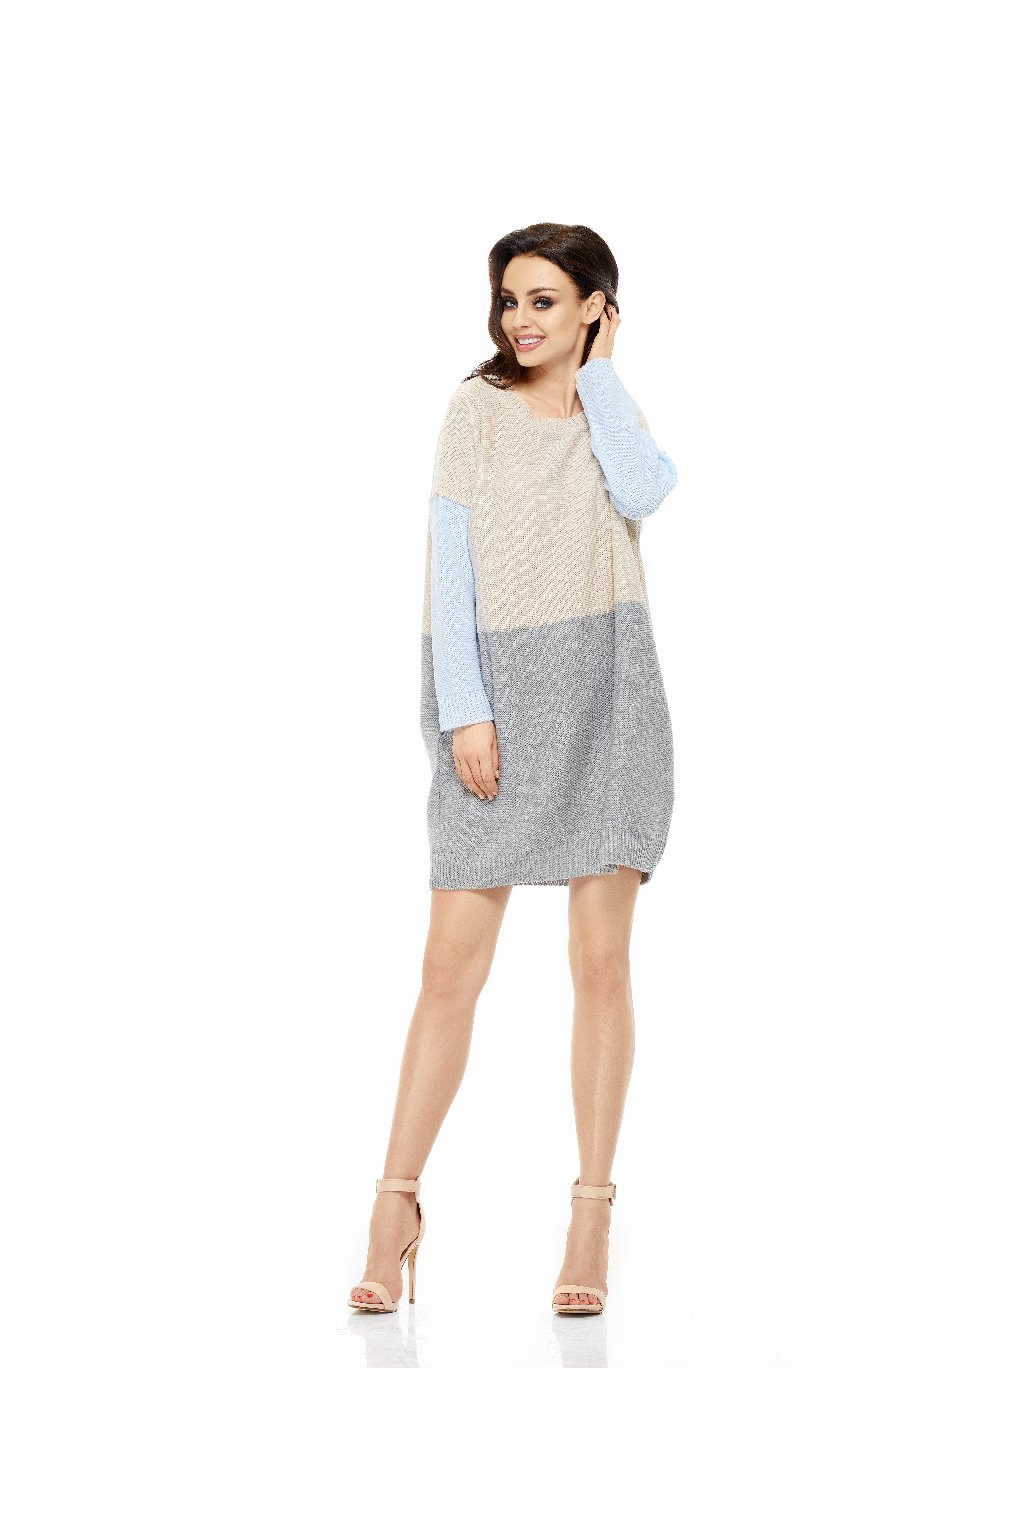 Dámské pletené šaty Lemoniade LS203 modrošedobéžové 1